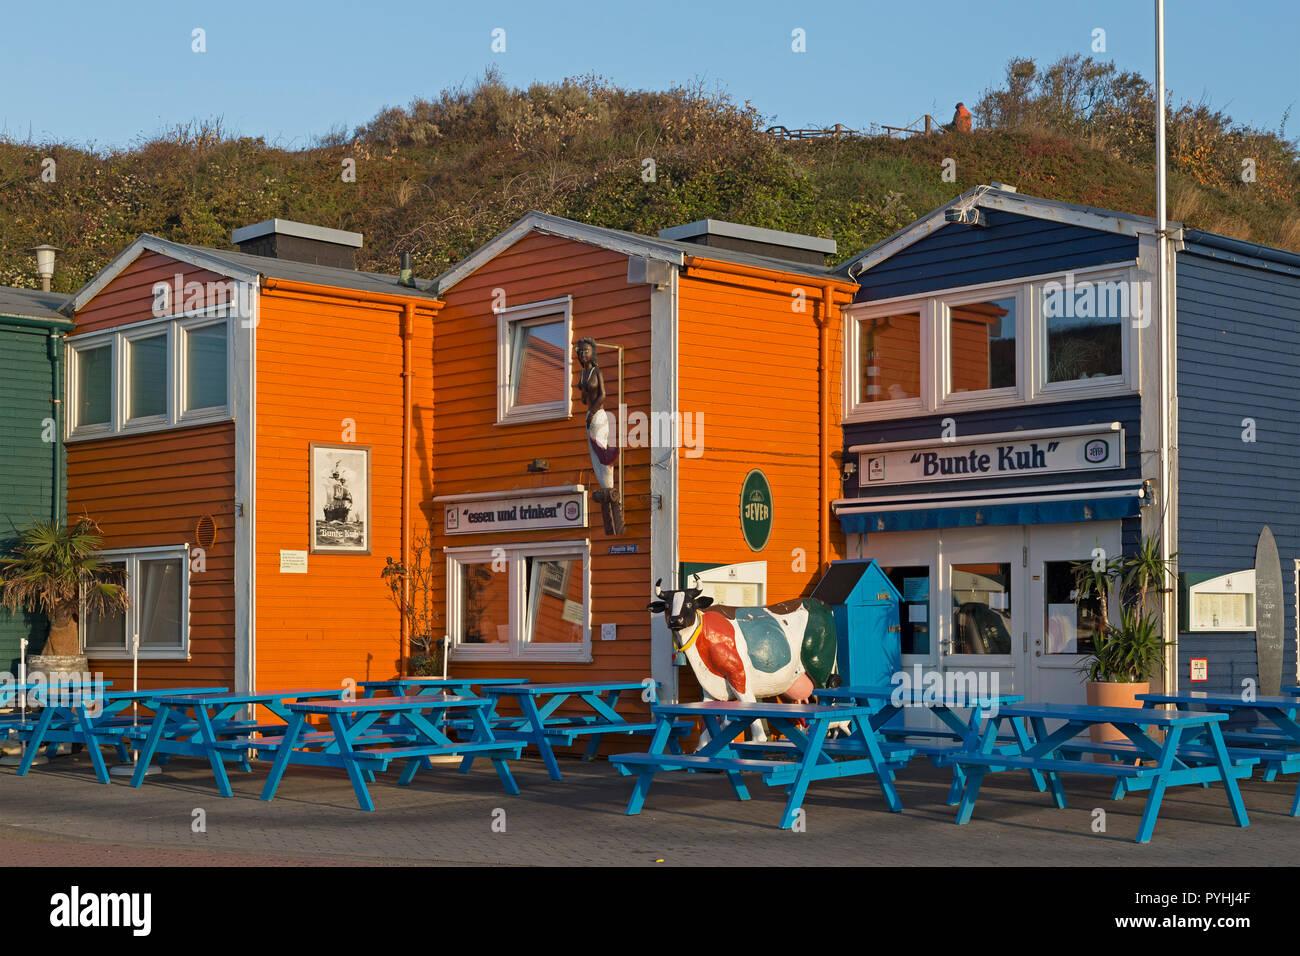 Hummerbuden (aragosta capanne), Isola di Helgoland, Schleswig-Holstein, Germania Immagini Stock